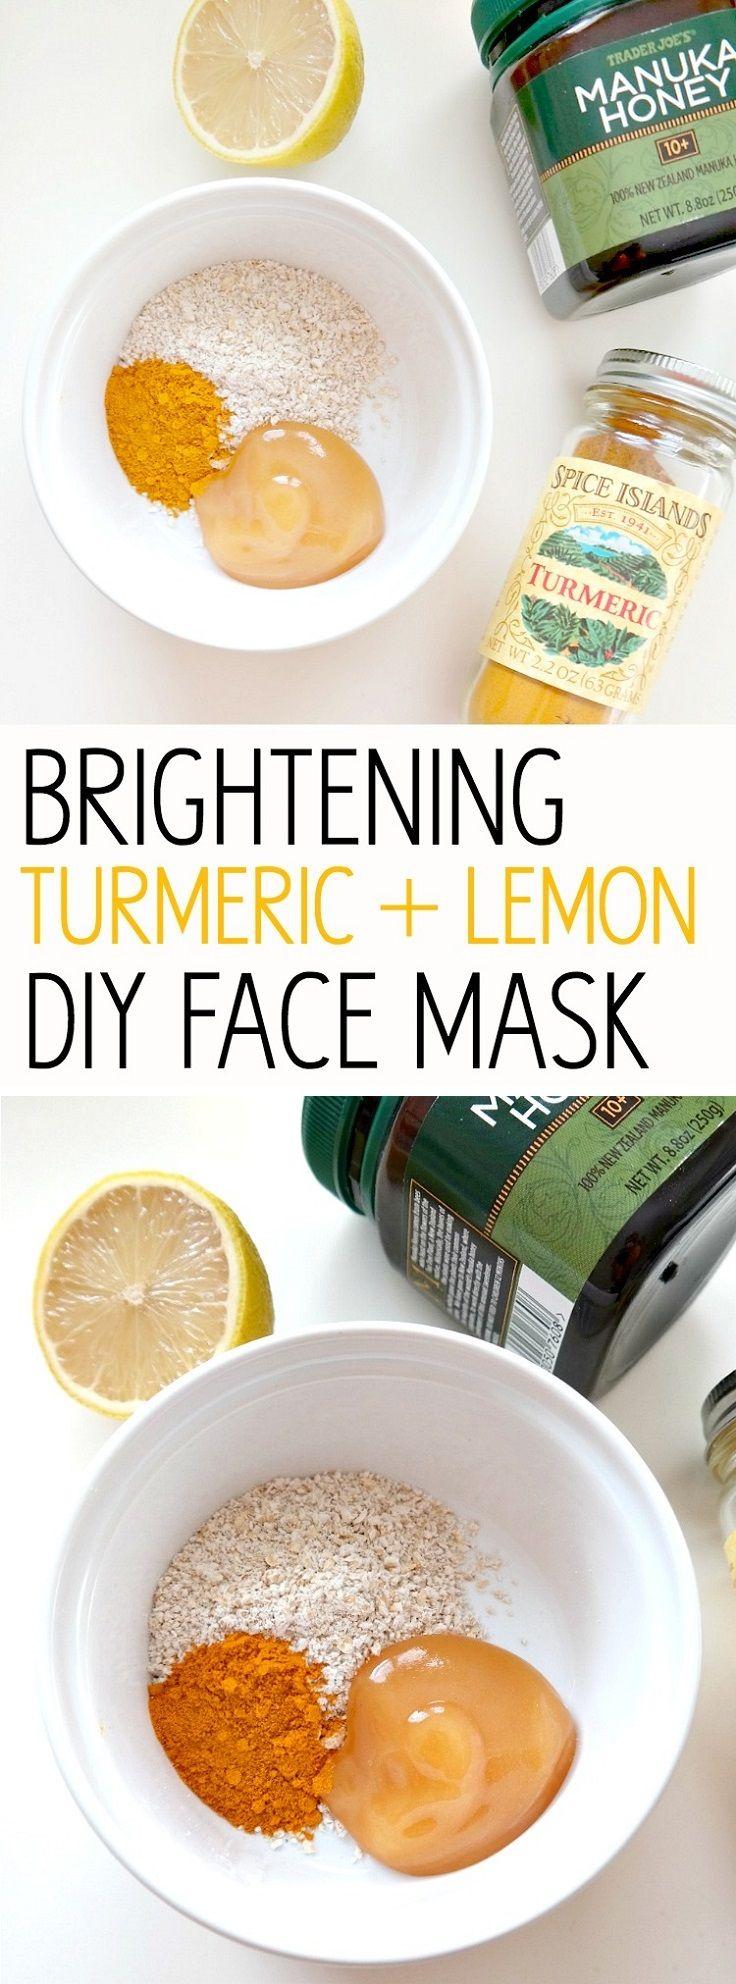 Brightening Turmeric + Lemon DIY Face Mask